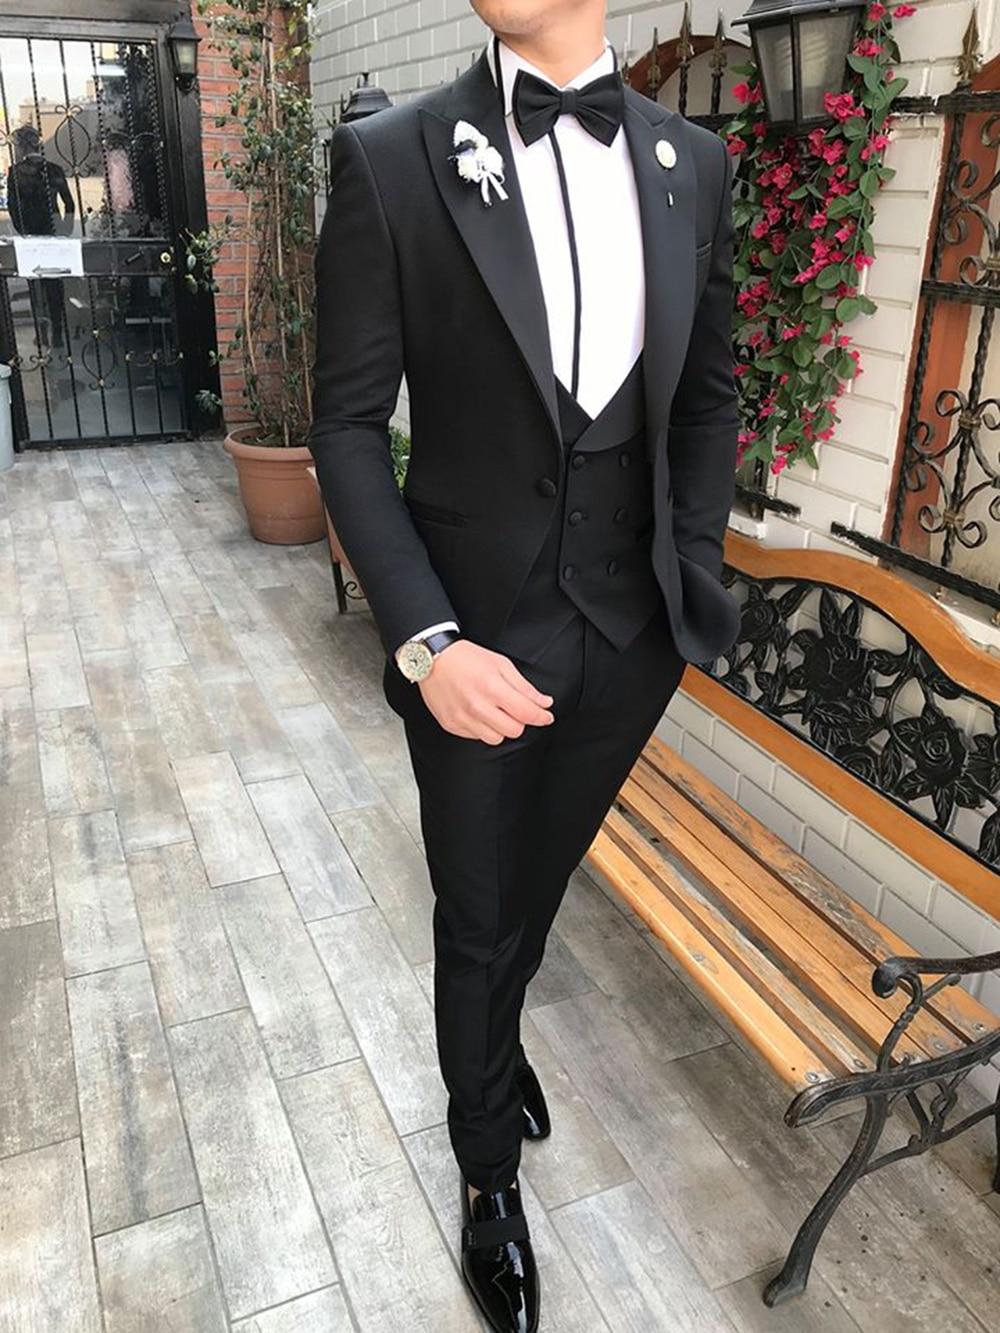 2020 New Casual Men's Suits Slim Fit 3 Piece Notch Lapel Prom Tuxedos Groomsmen For Wedding (Blazer+Vest+Pants)